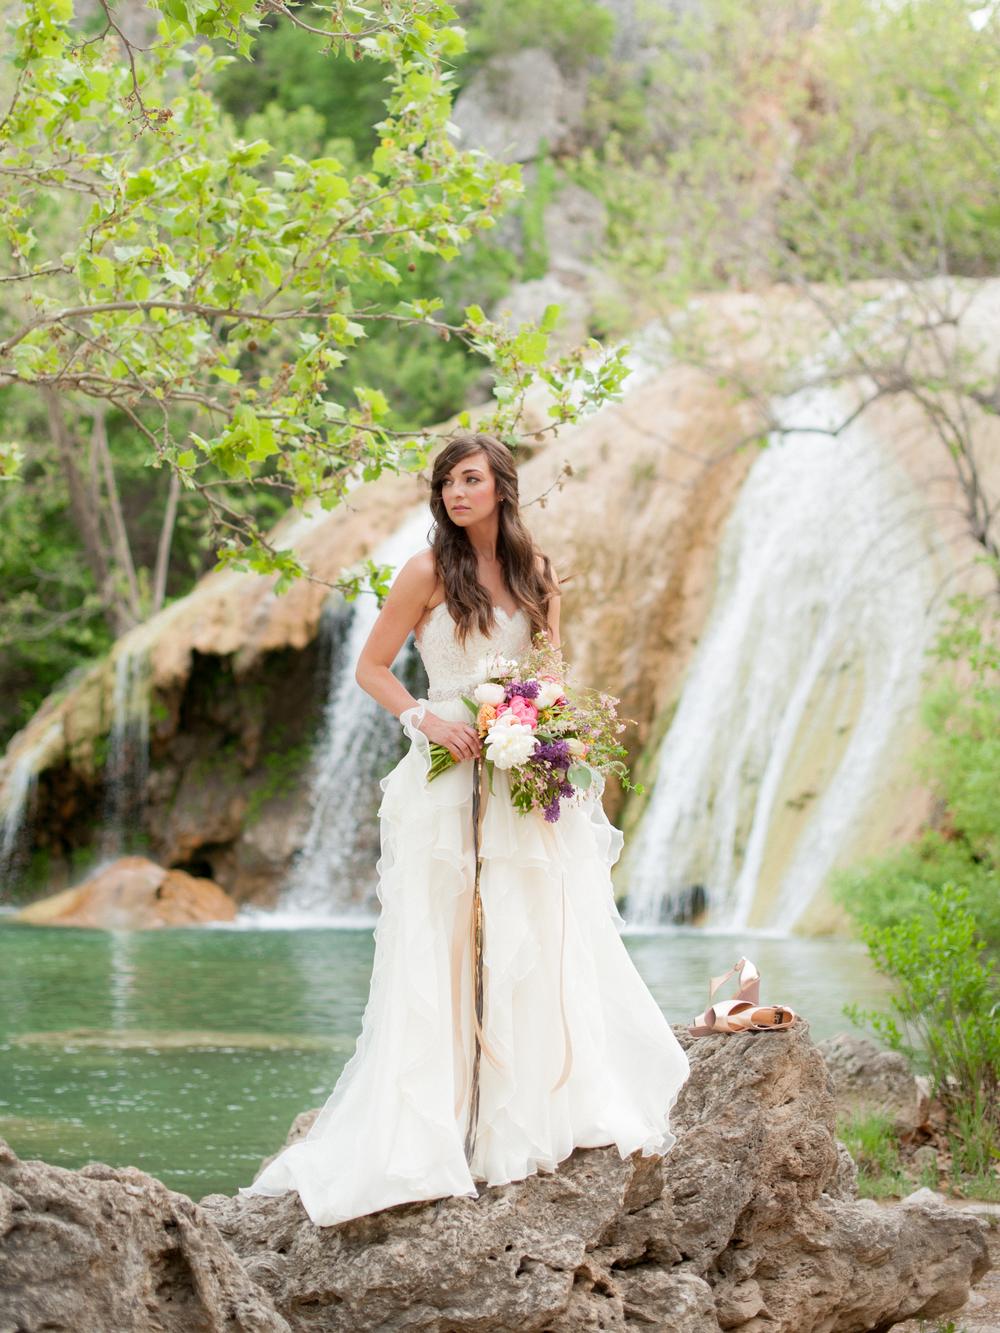 Jayme-bridals0020.jpg